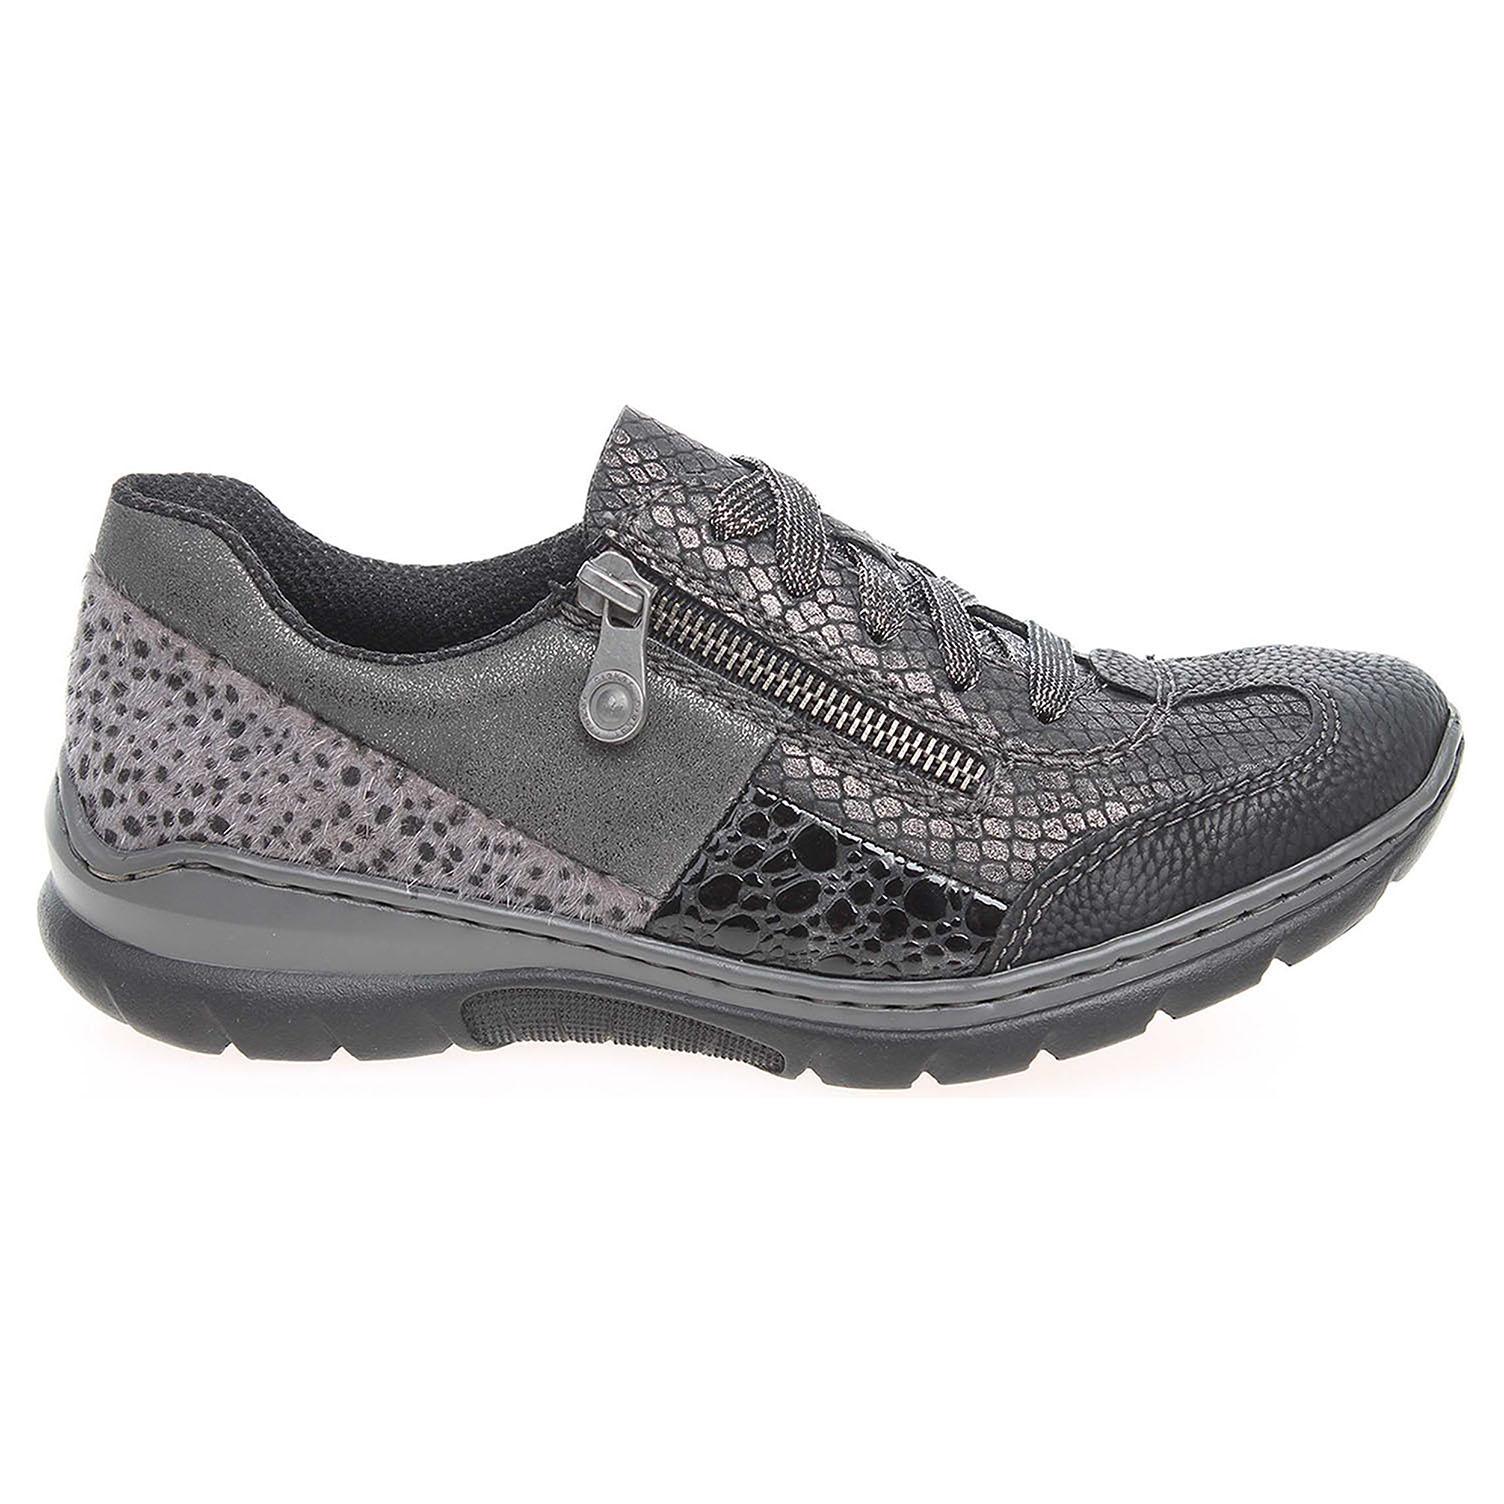 Ecco Rieker dámská obuv L3223-00 černá-šedá 23200575 abec5b57c1f